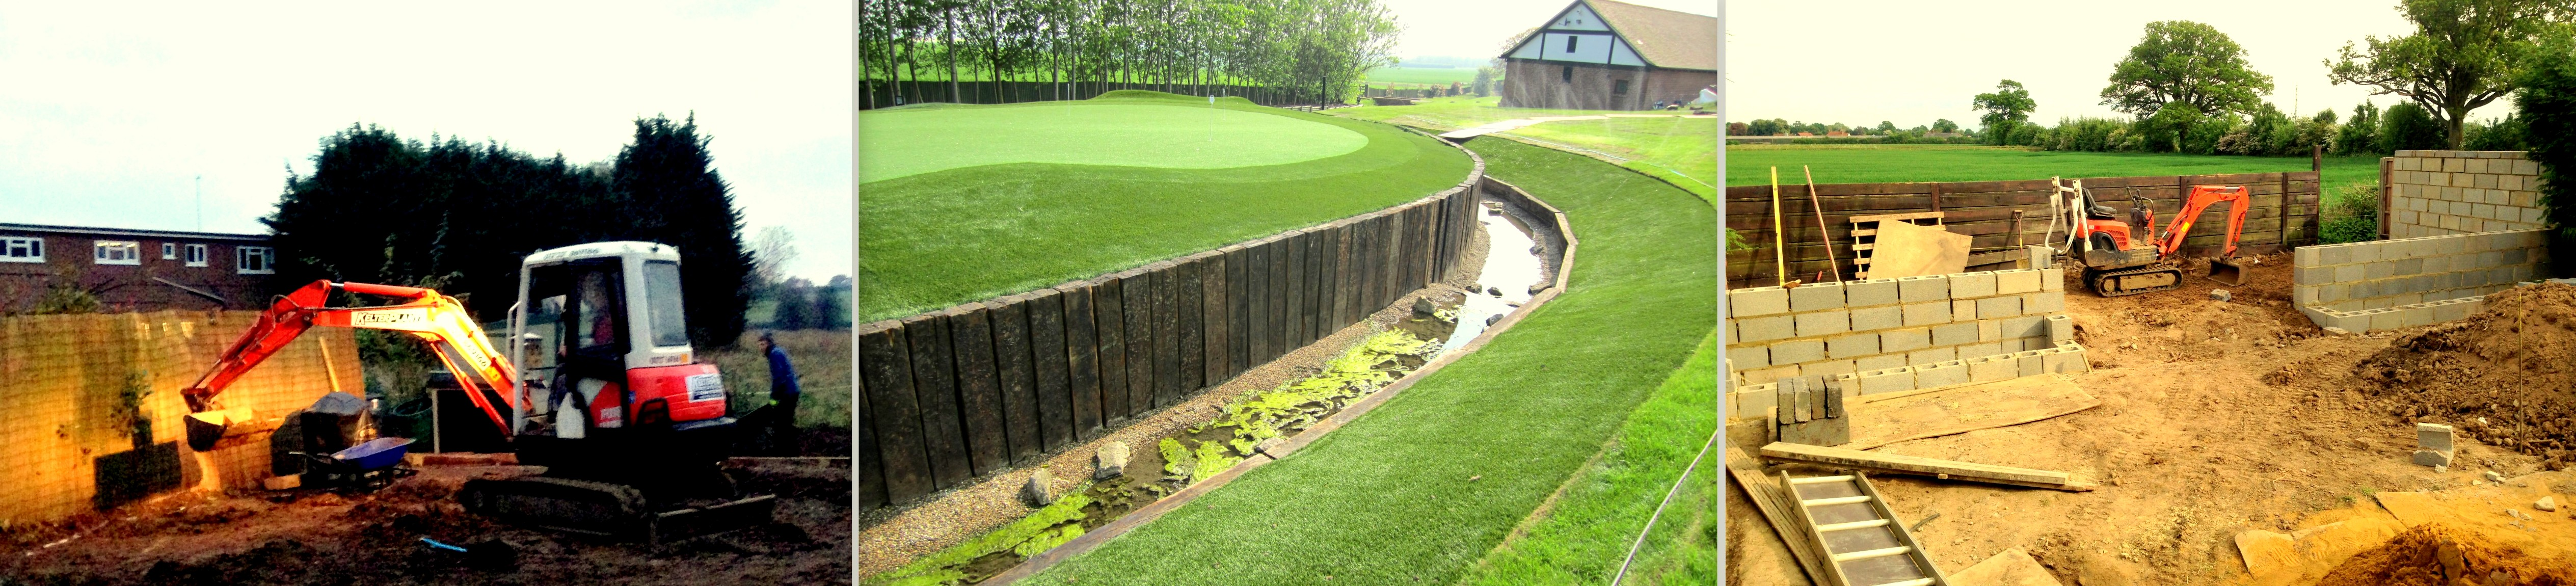 Exeter Landscapes Landscaping Exeter | Landscape Design ...